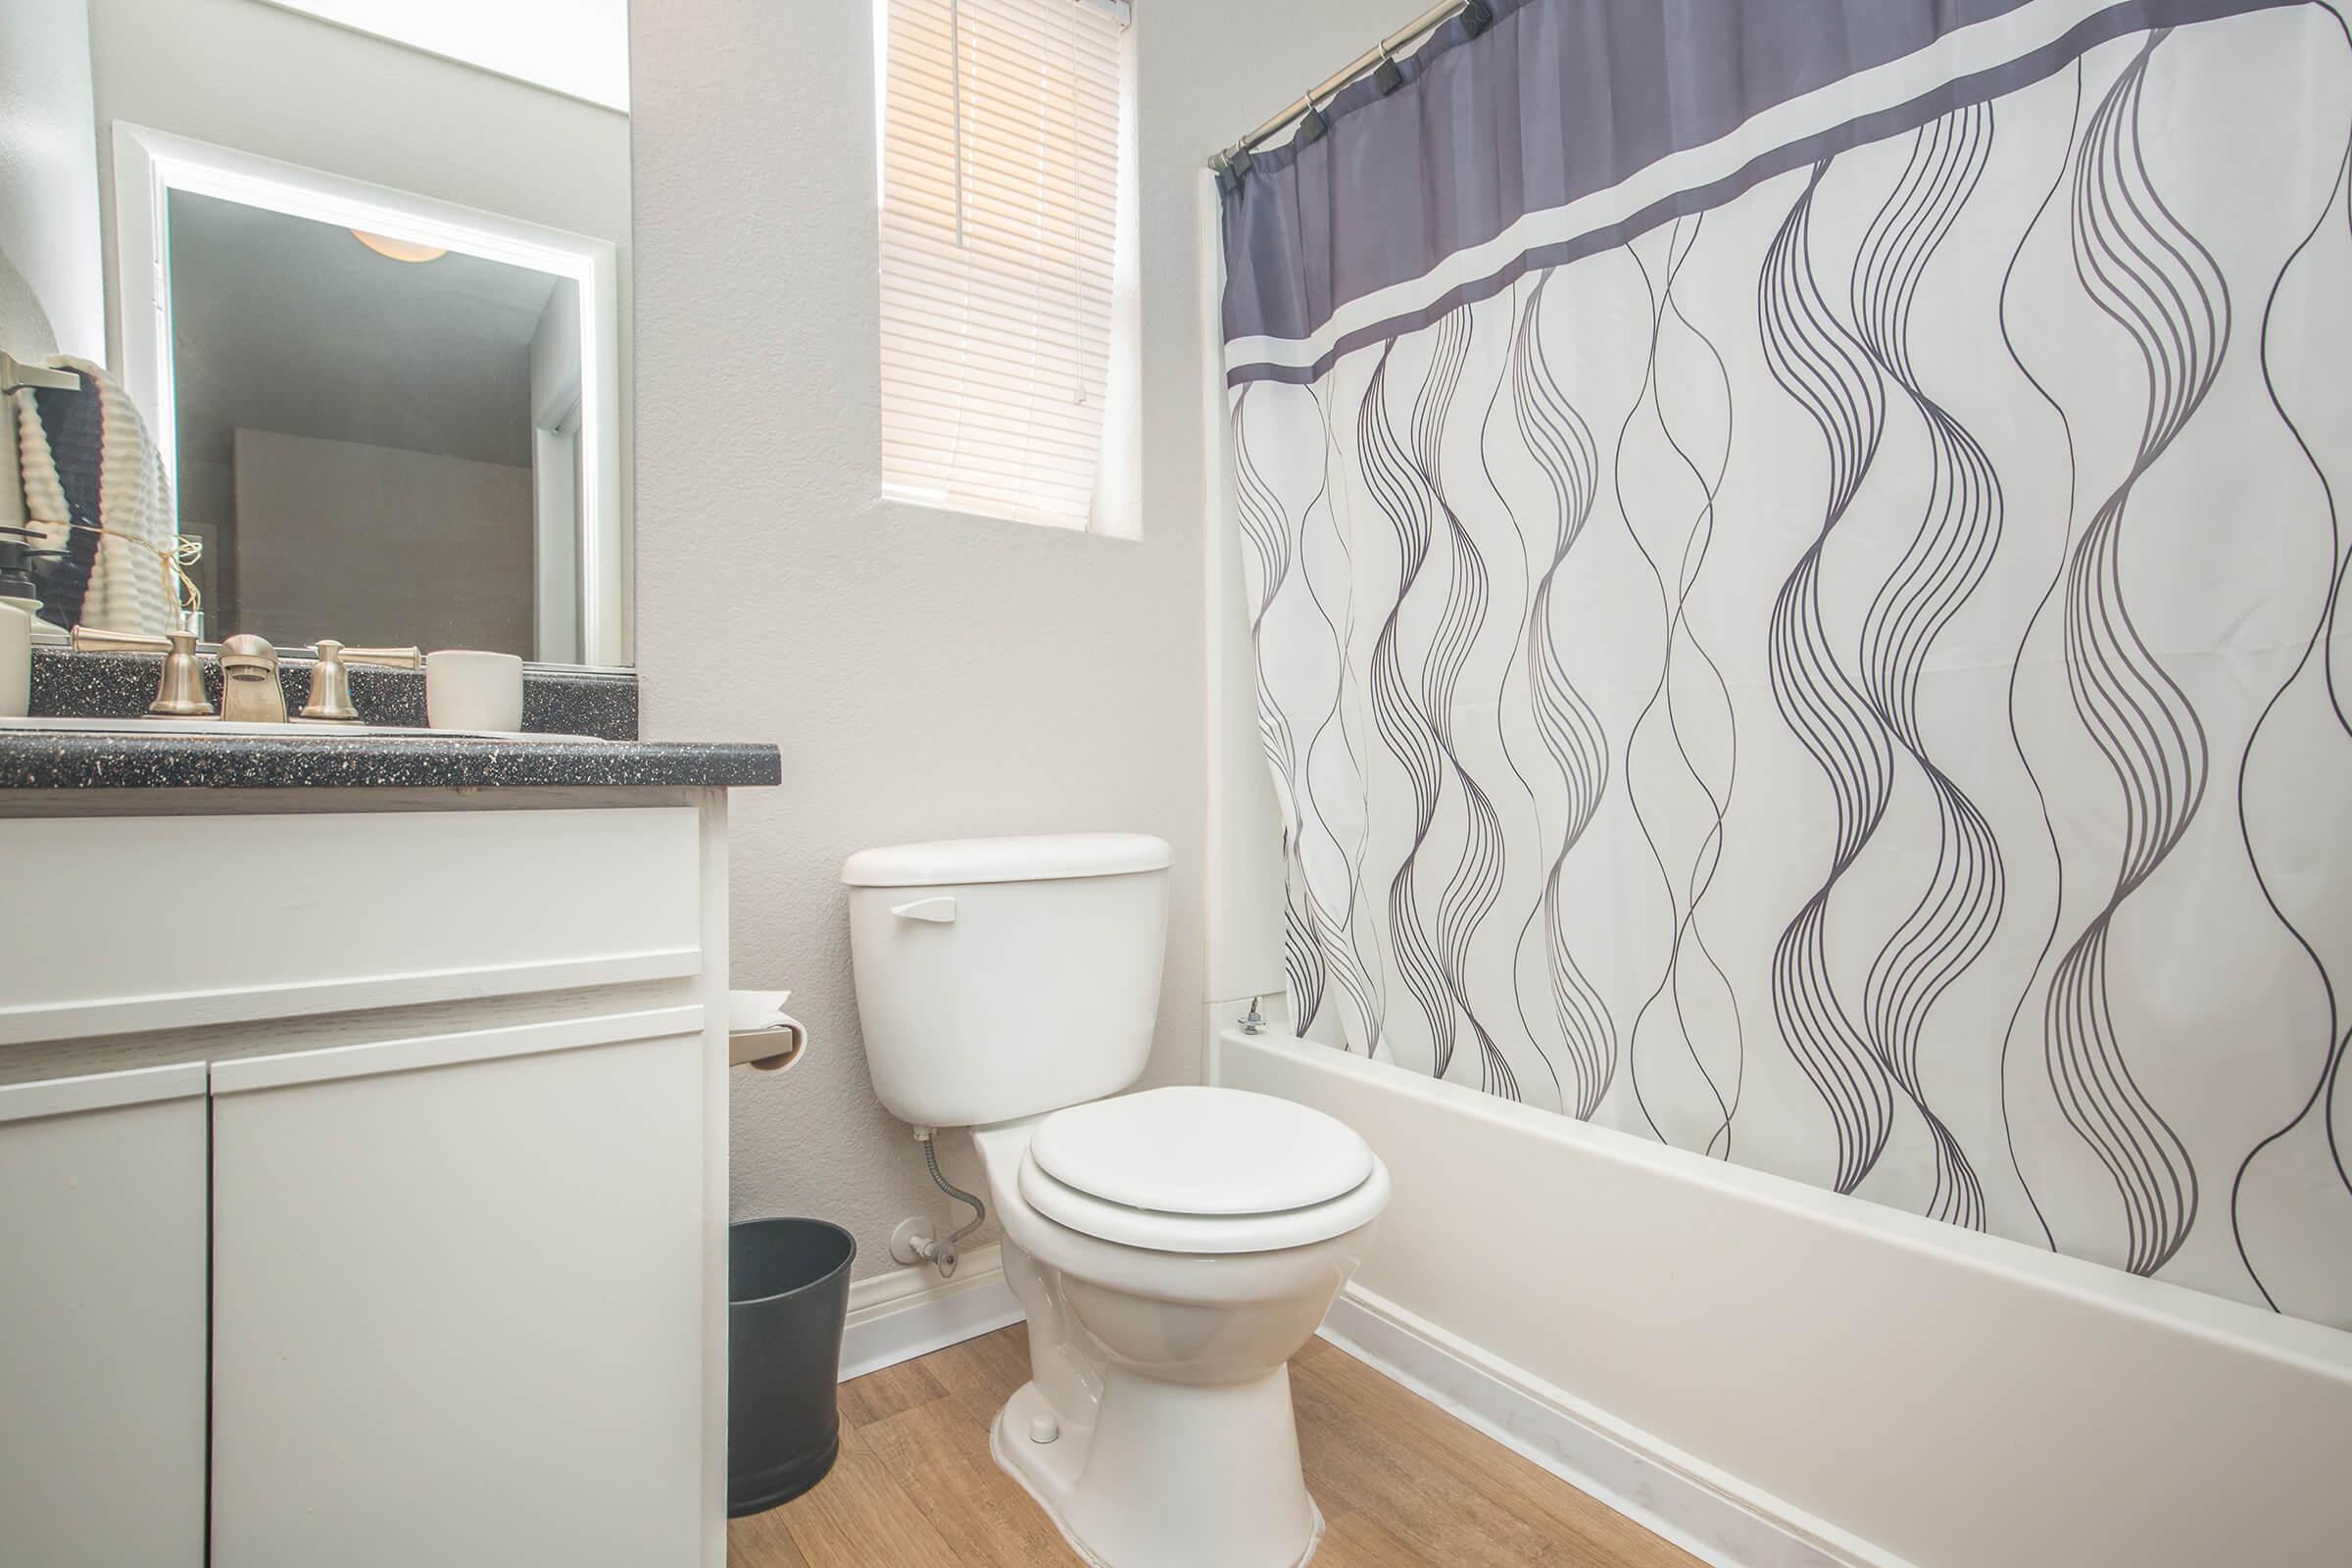 Chic bathroom at Siena Townhomes in Las Vegas, Nevada